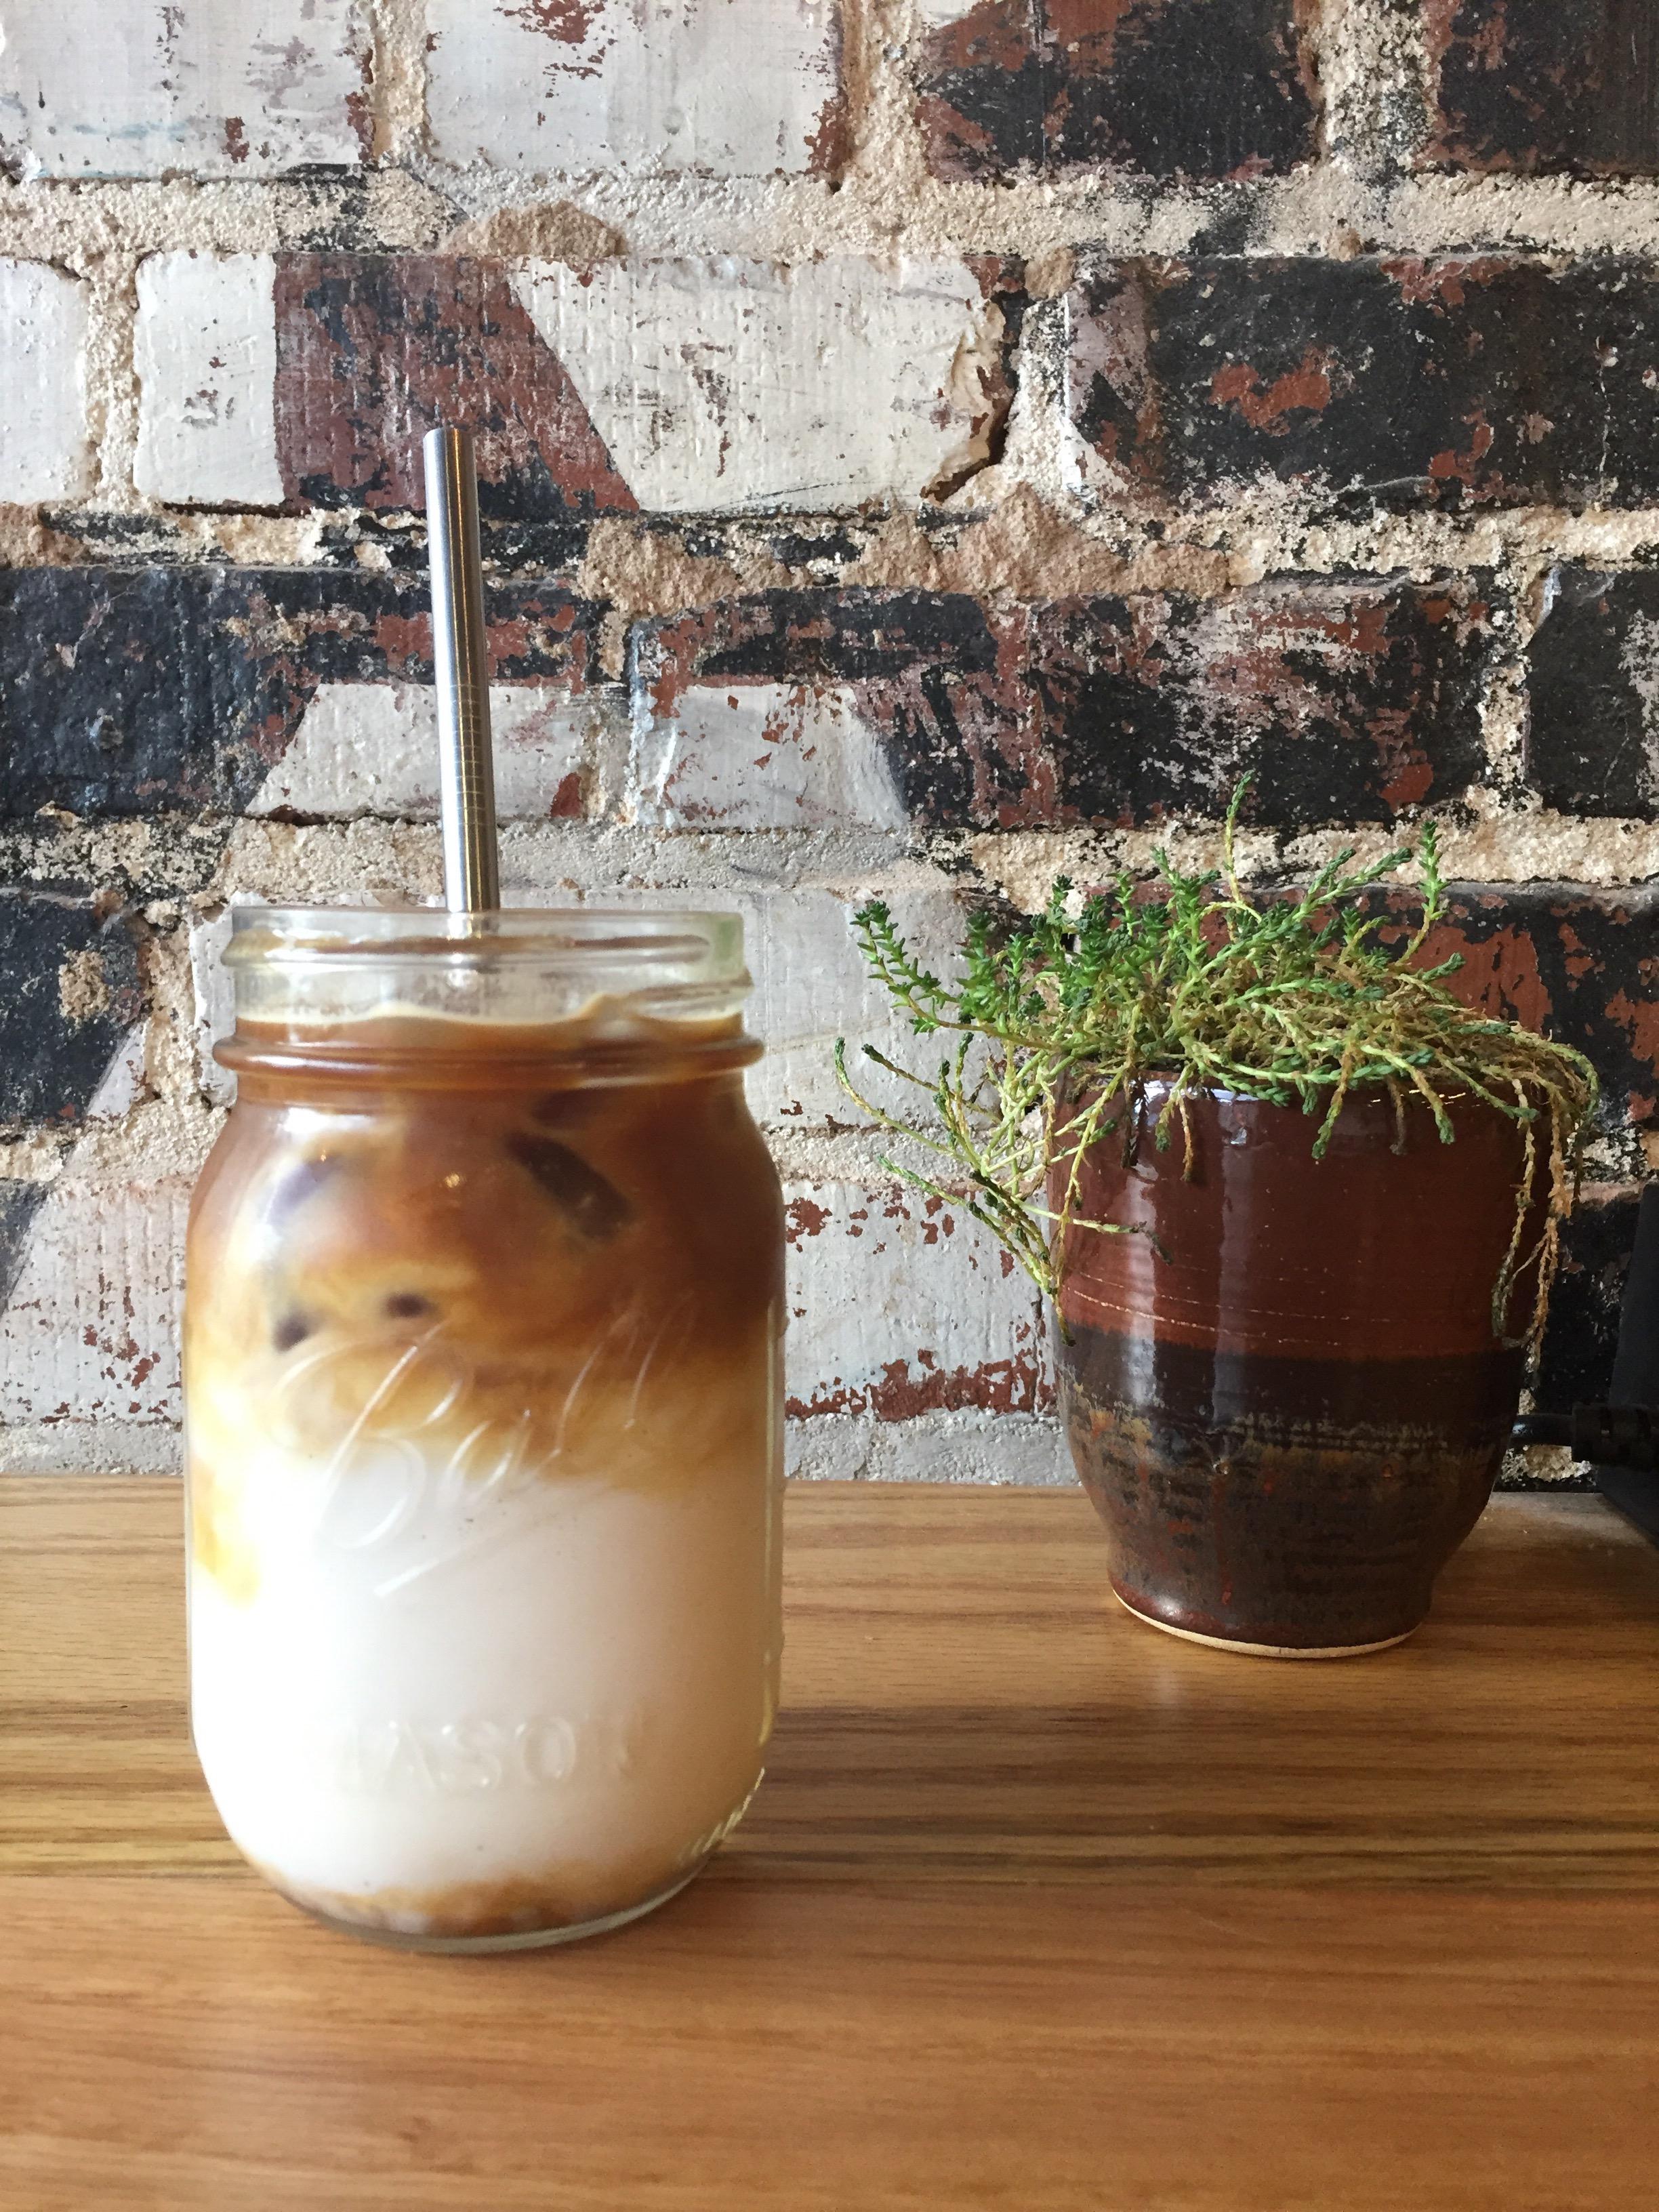 Iced almond milk latte at Belltower Artisans